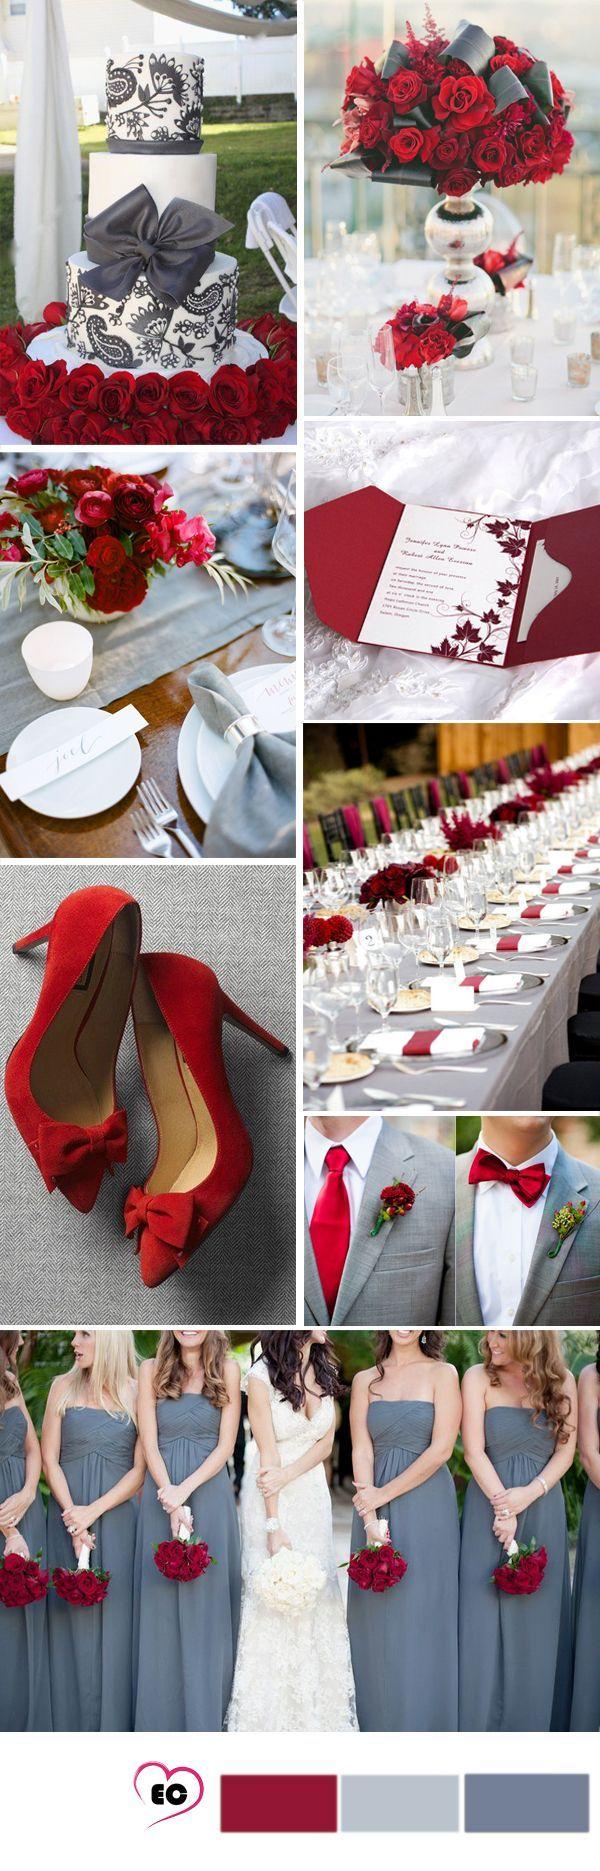 awesome wedding themes ideas best photos